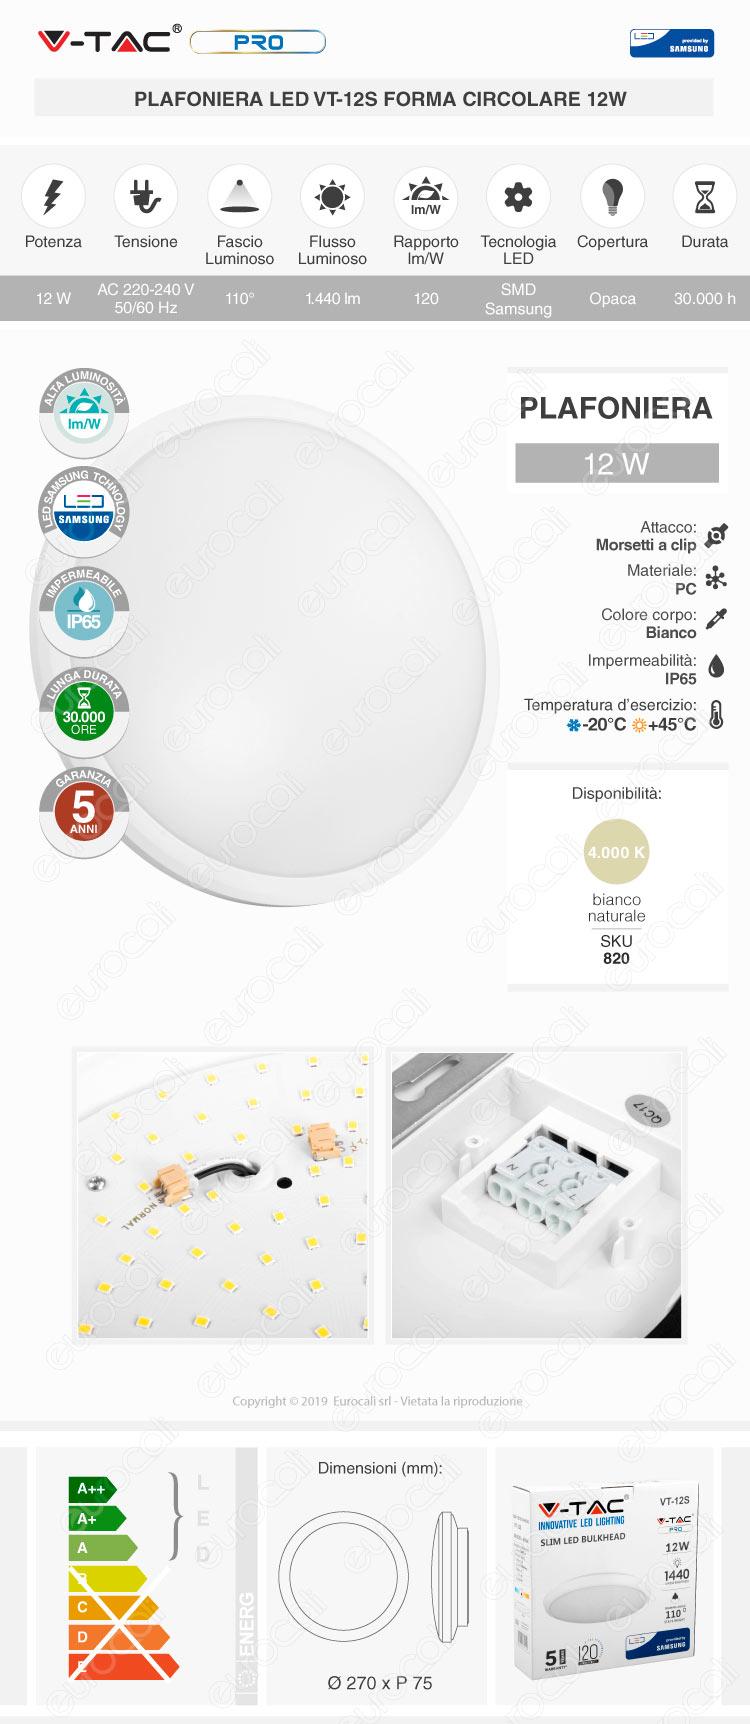 V-Tac PRO VT-12 Plafoniera LED 12W Forma Circolare Bianco Chip Samsung